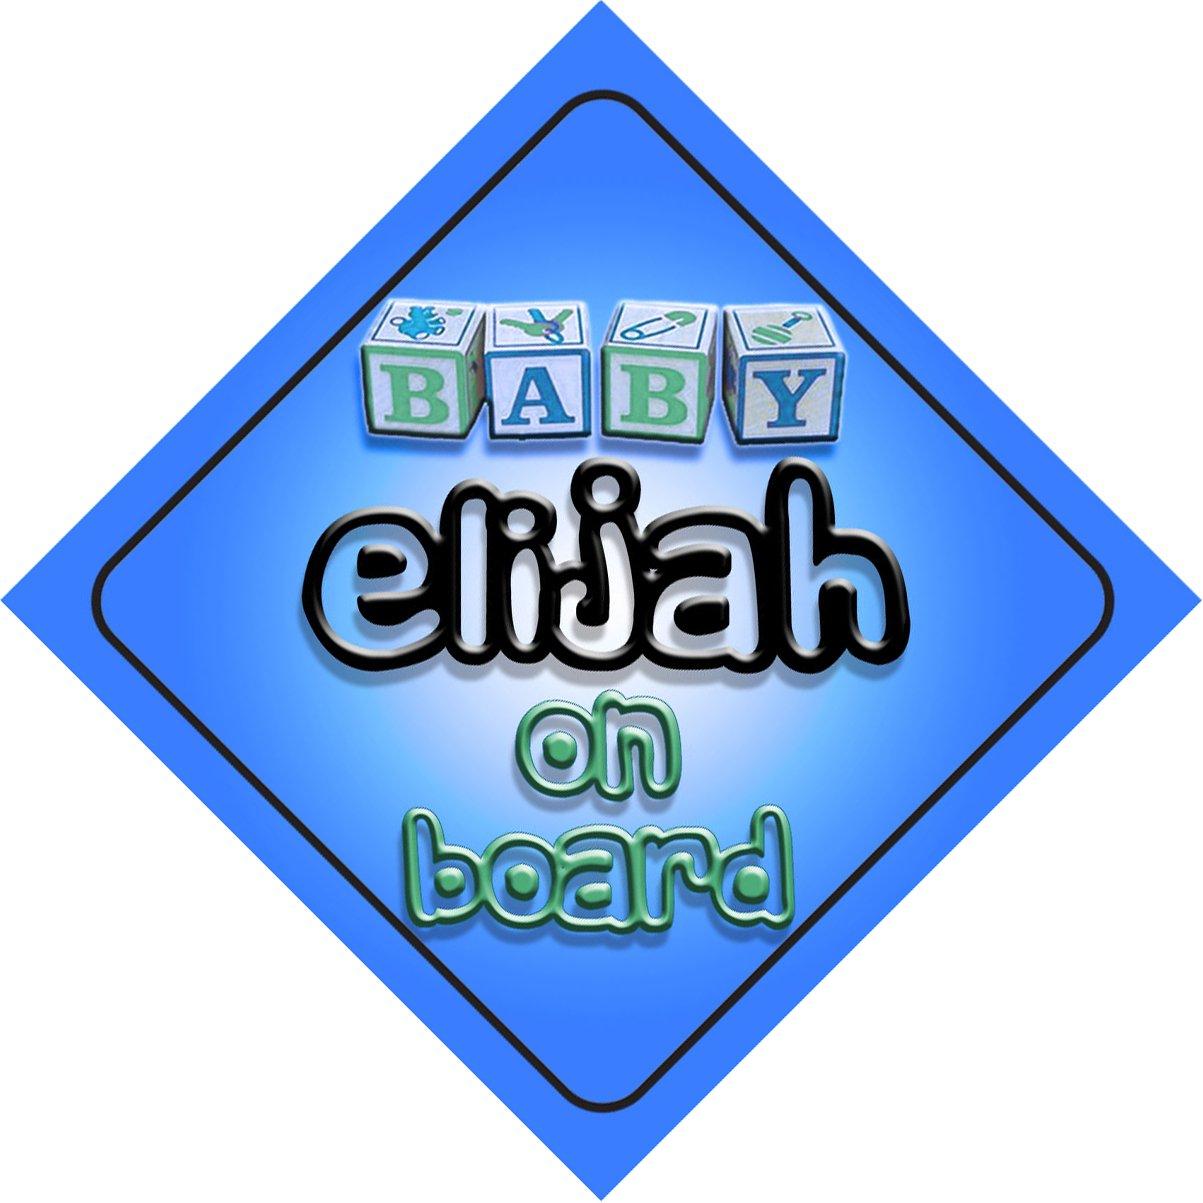 Baby Boy Elijah on board novelty car sign gift / present for new child / newborn baby Quality Goods Ltd